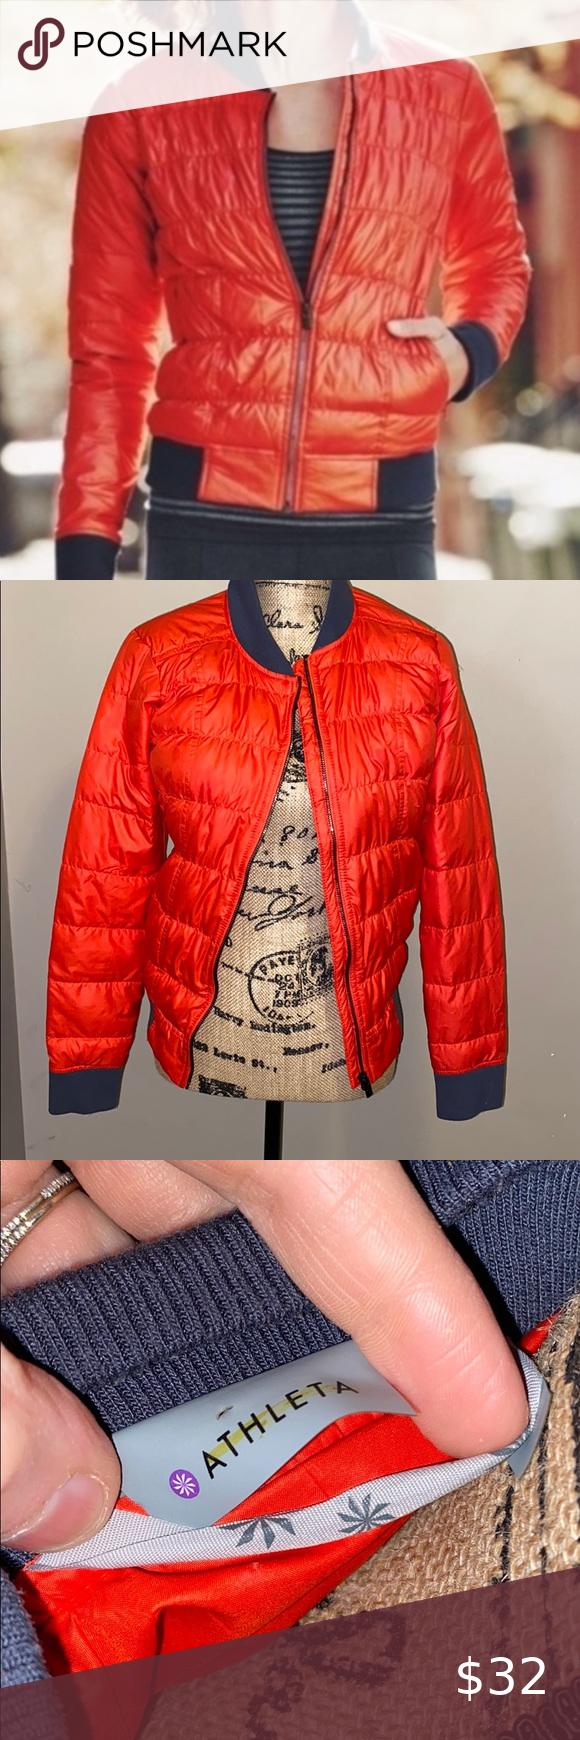 Athleta Goose Down Bomber Jacket In 2020 Clothes Design Athleta Bomber Jacket [ 1740 x 580 Pixel ]